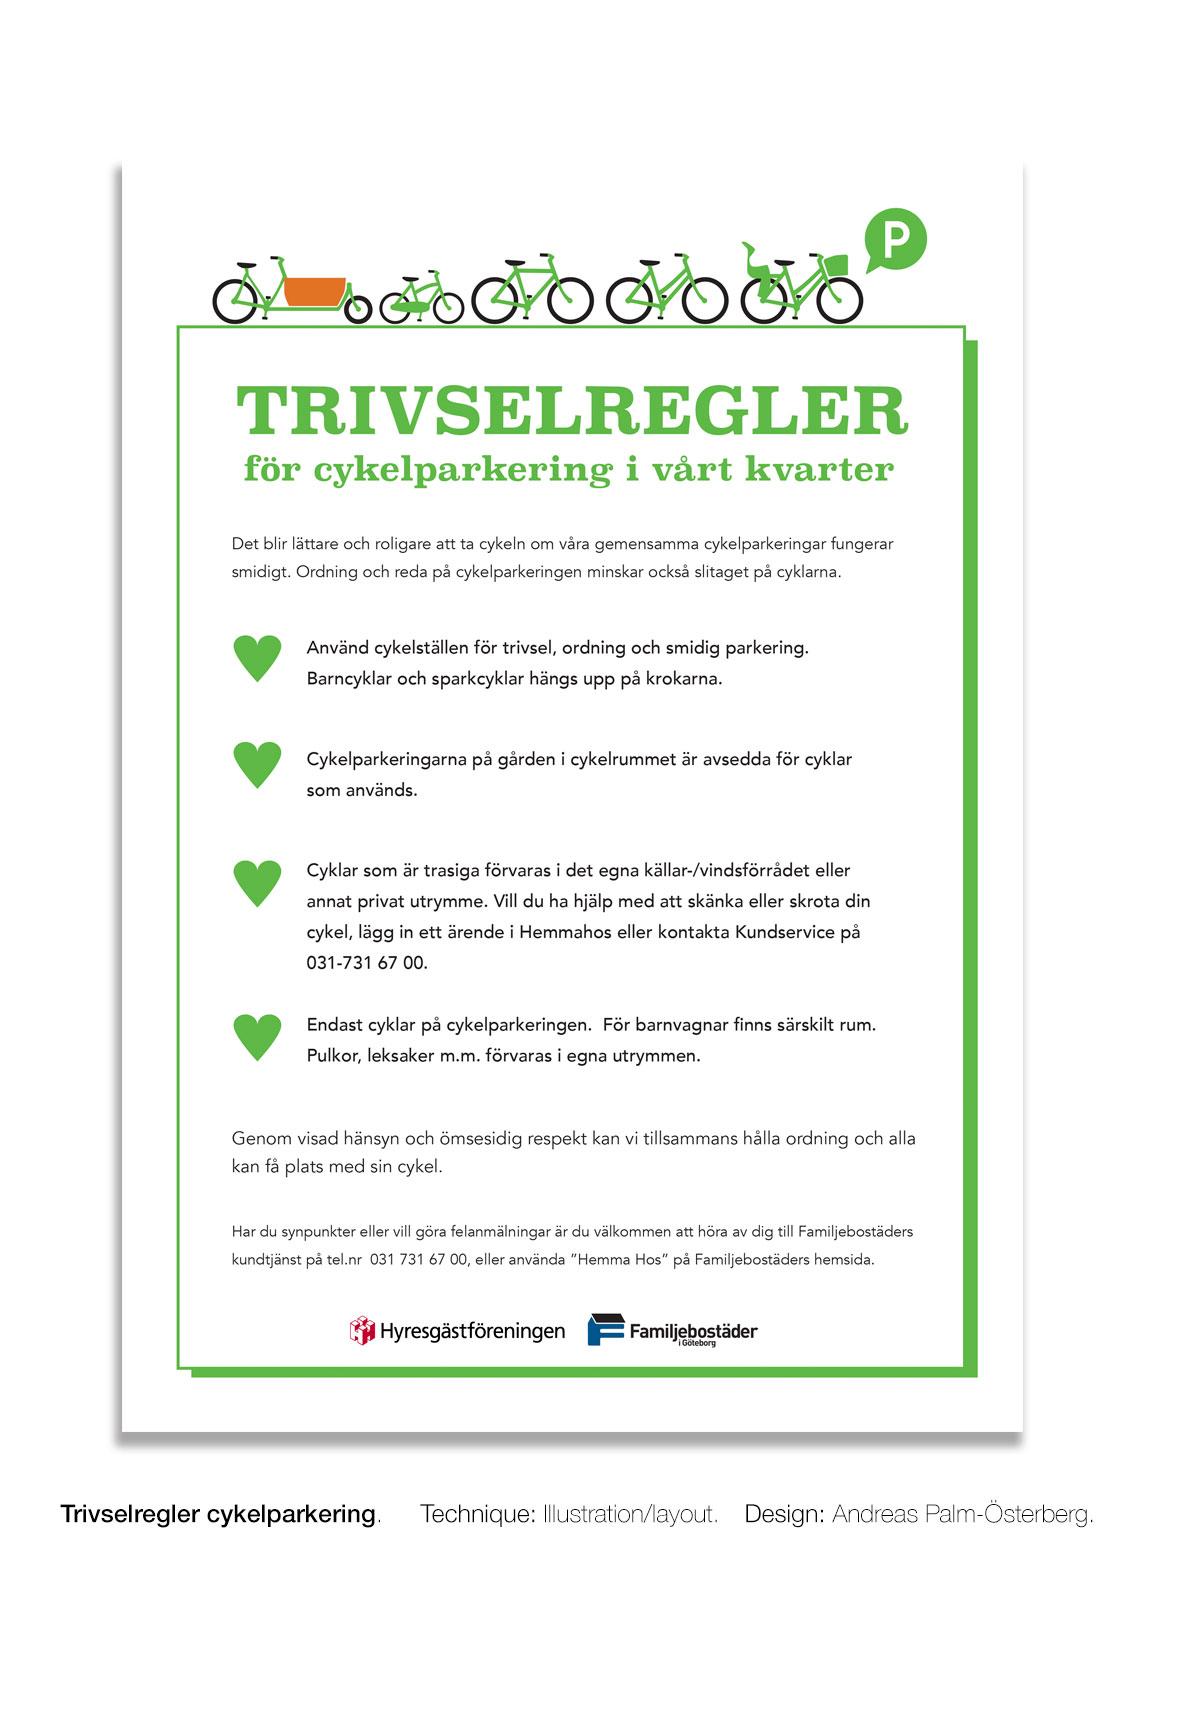 Ekologisk_stadsdel_trivselregler_cykelparkering